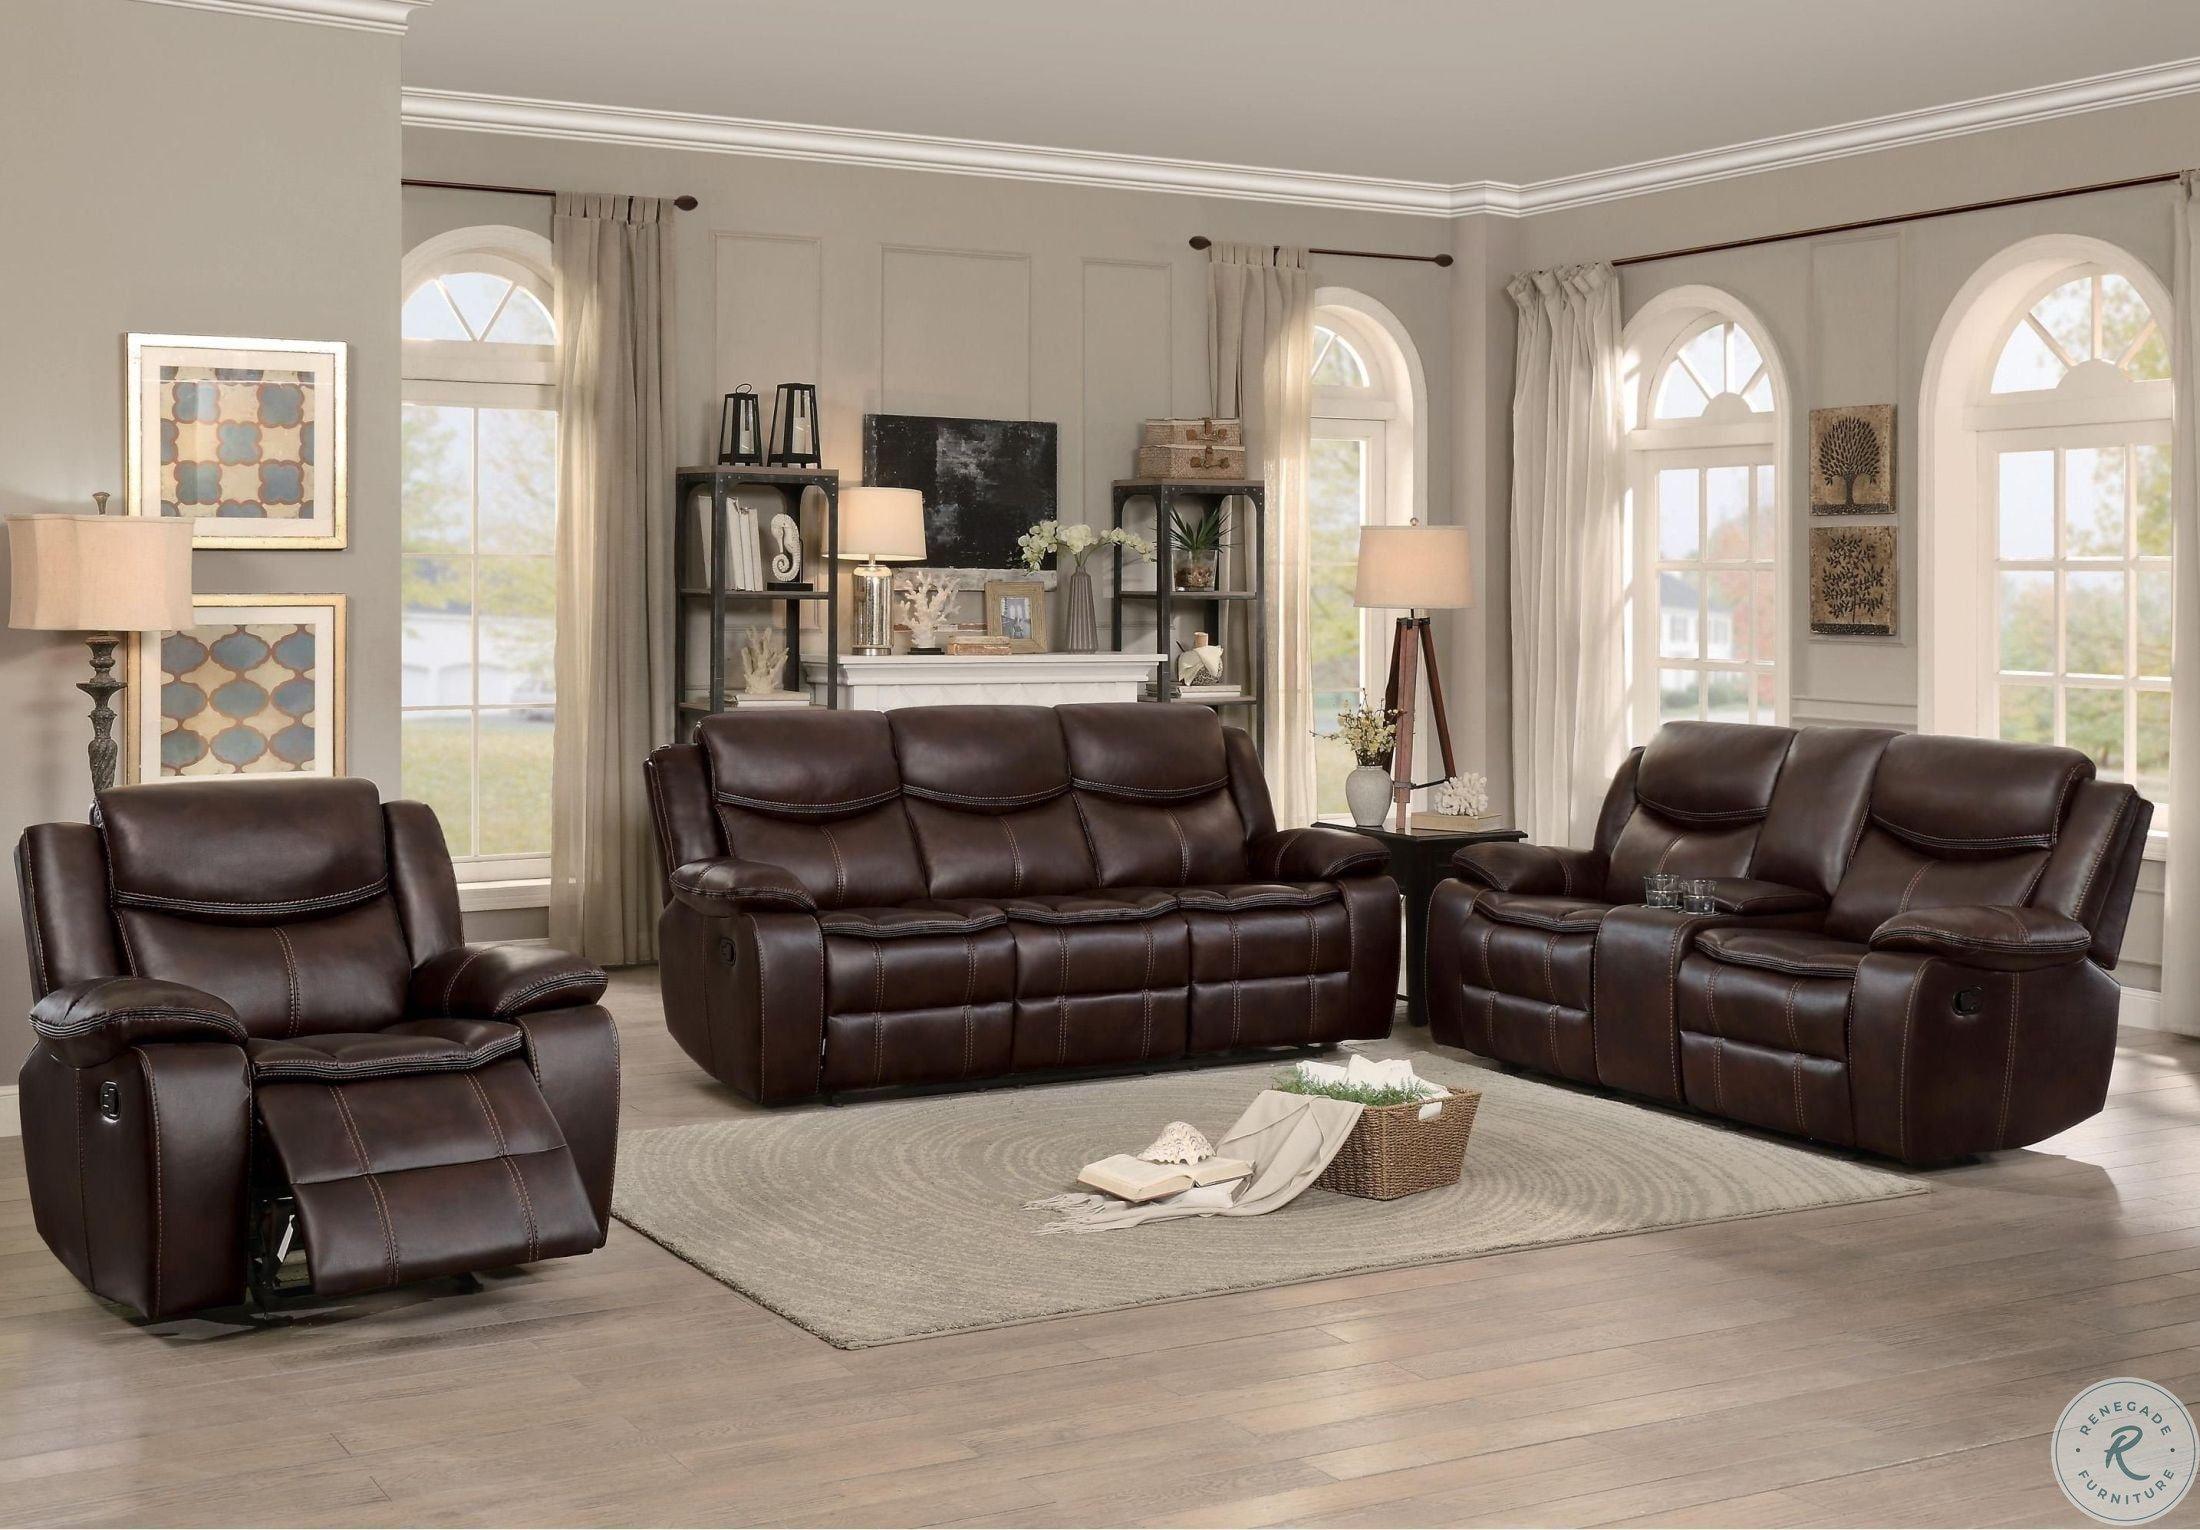 Bastrop Dark Brown Reclining Living Room Set In 2020 Brown Leather Couch Living Room Leather Couches Living Room Brown Furniture Living Room #warnerton #chocolate #power #reclining #living #room #set